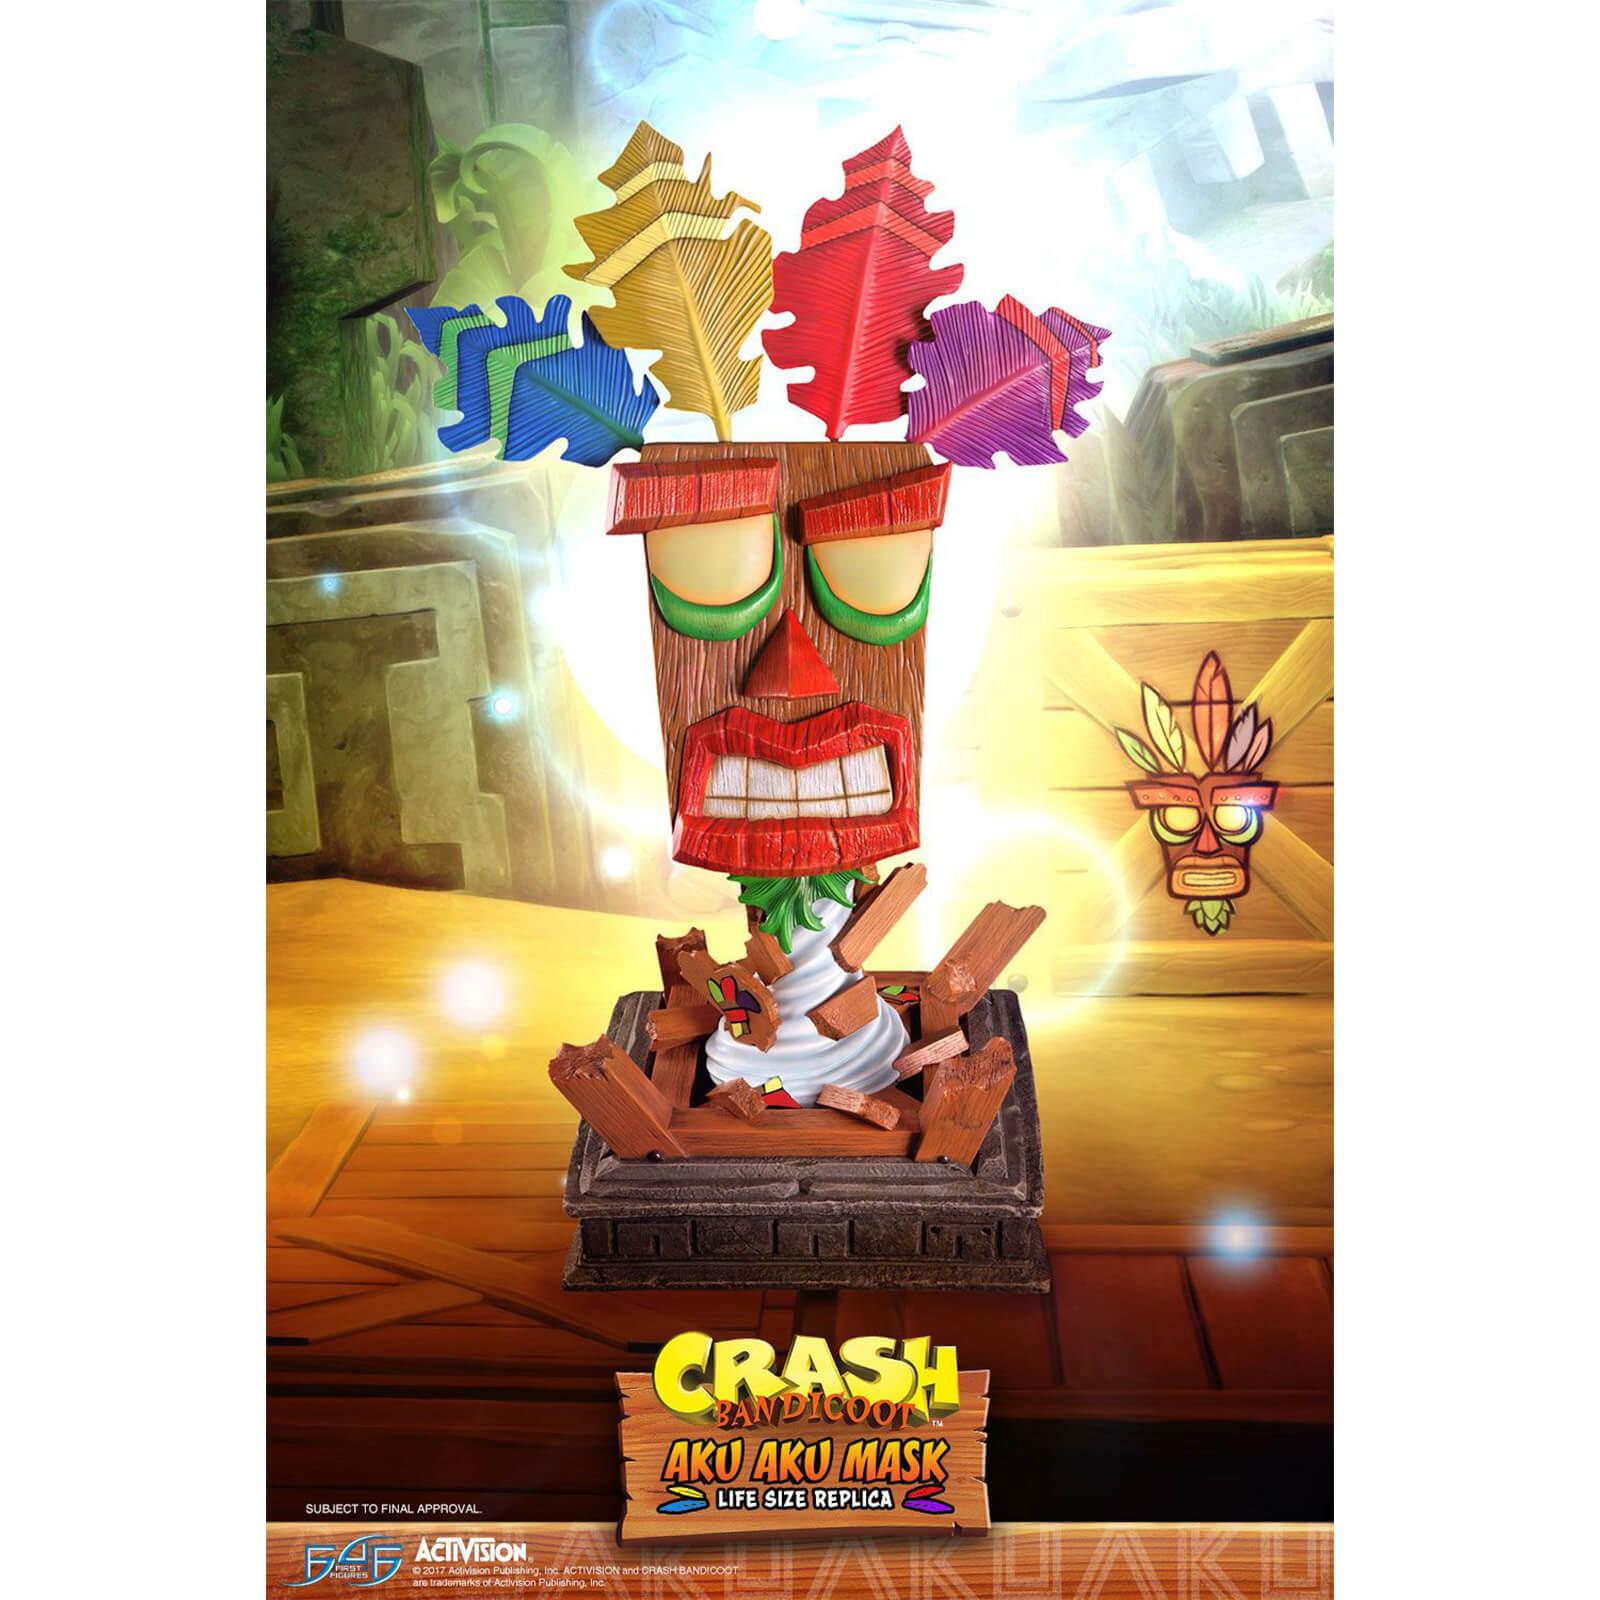 Image of First 4 Figures Crash Bandicoot Aku Aku Mask Life Size Resin Statue